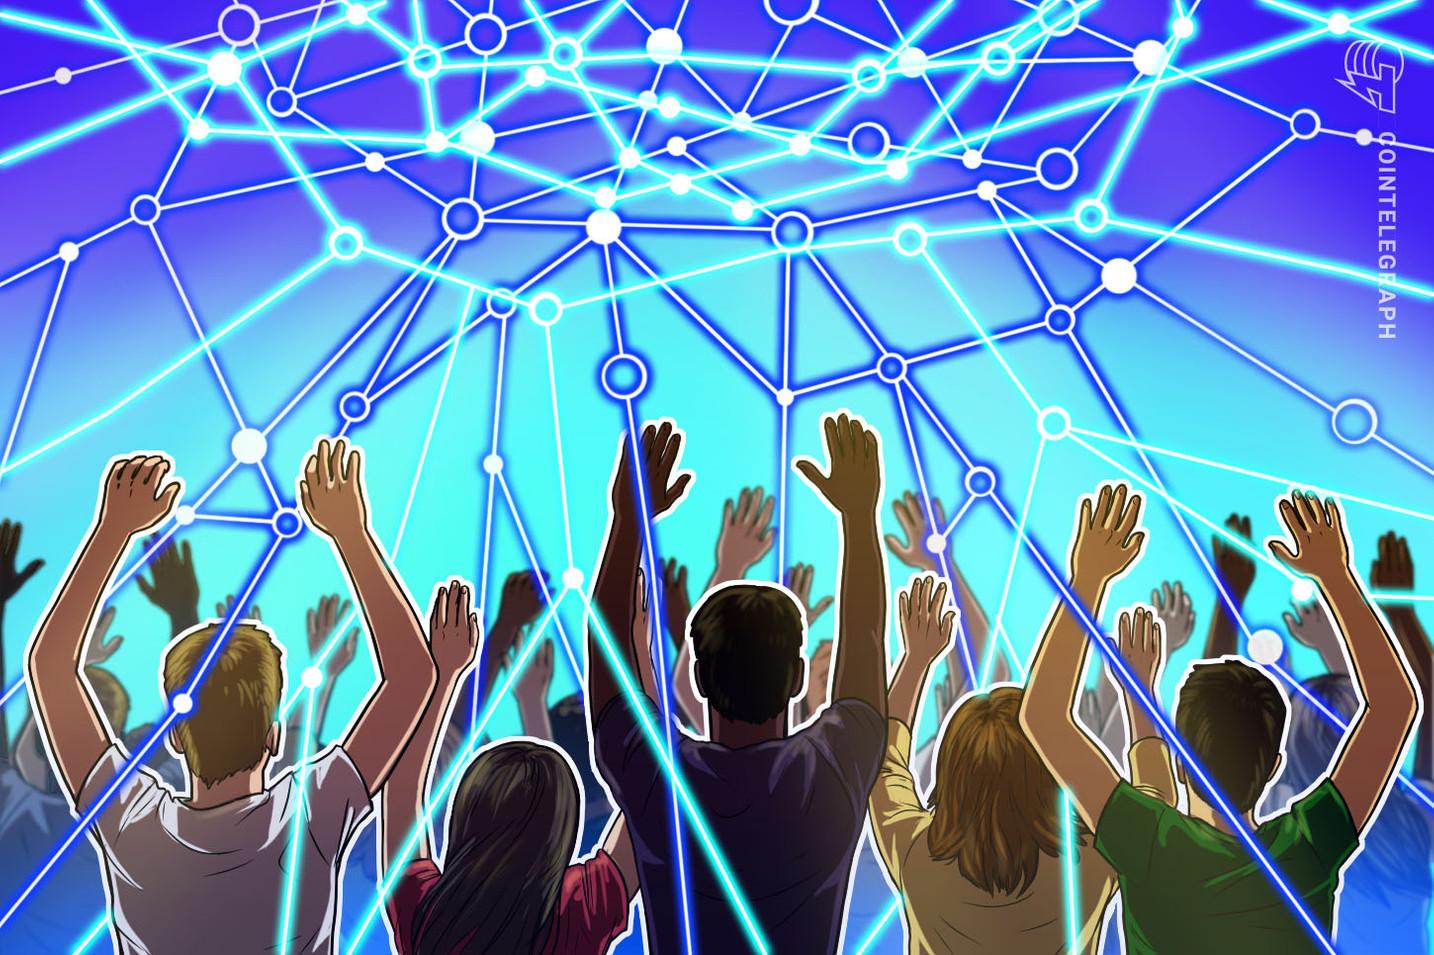 CasperLabs readies blockchain platform for 2021 mainnet launch with $14M private sale